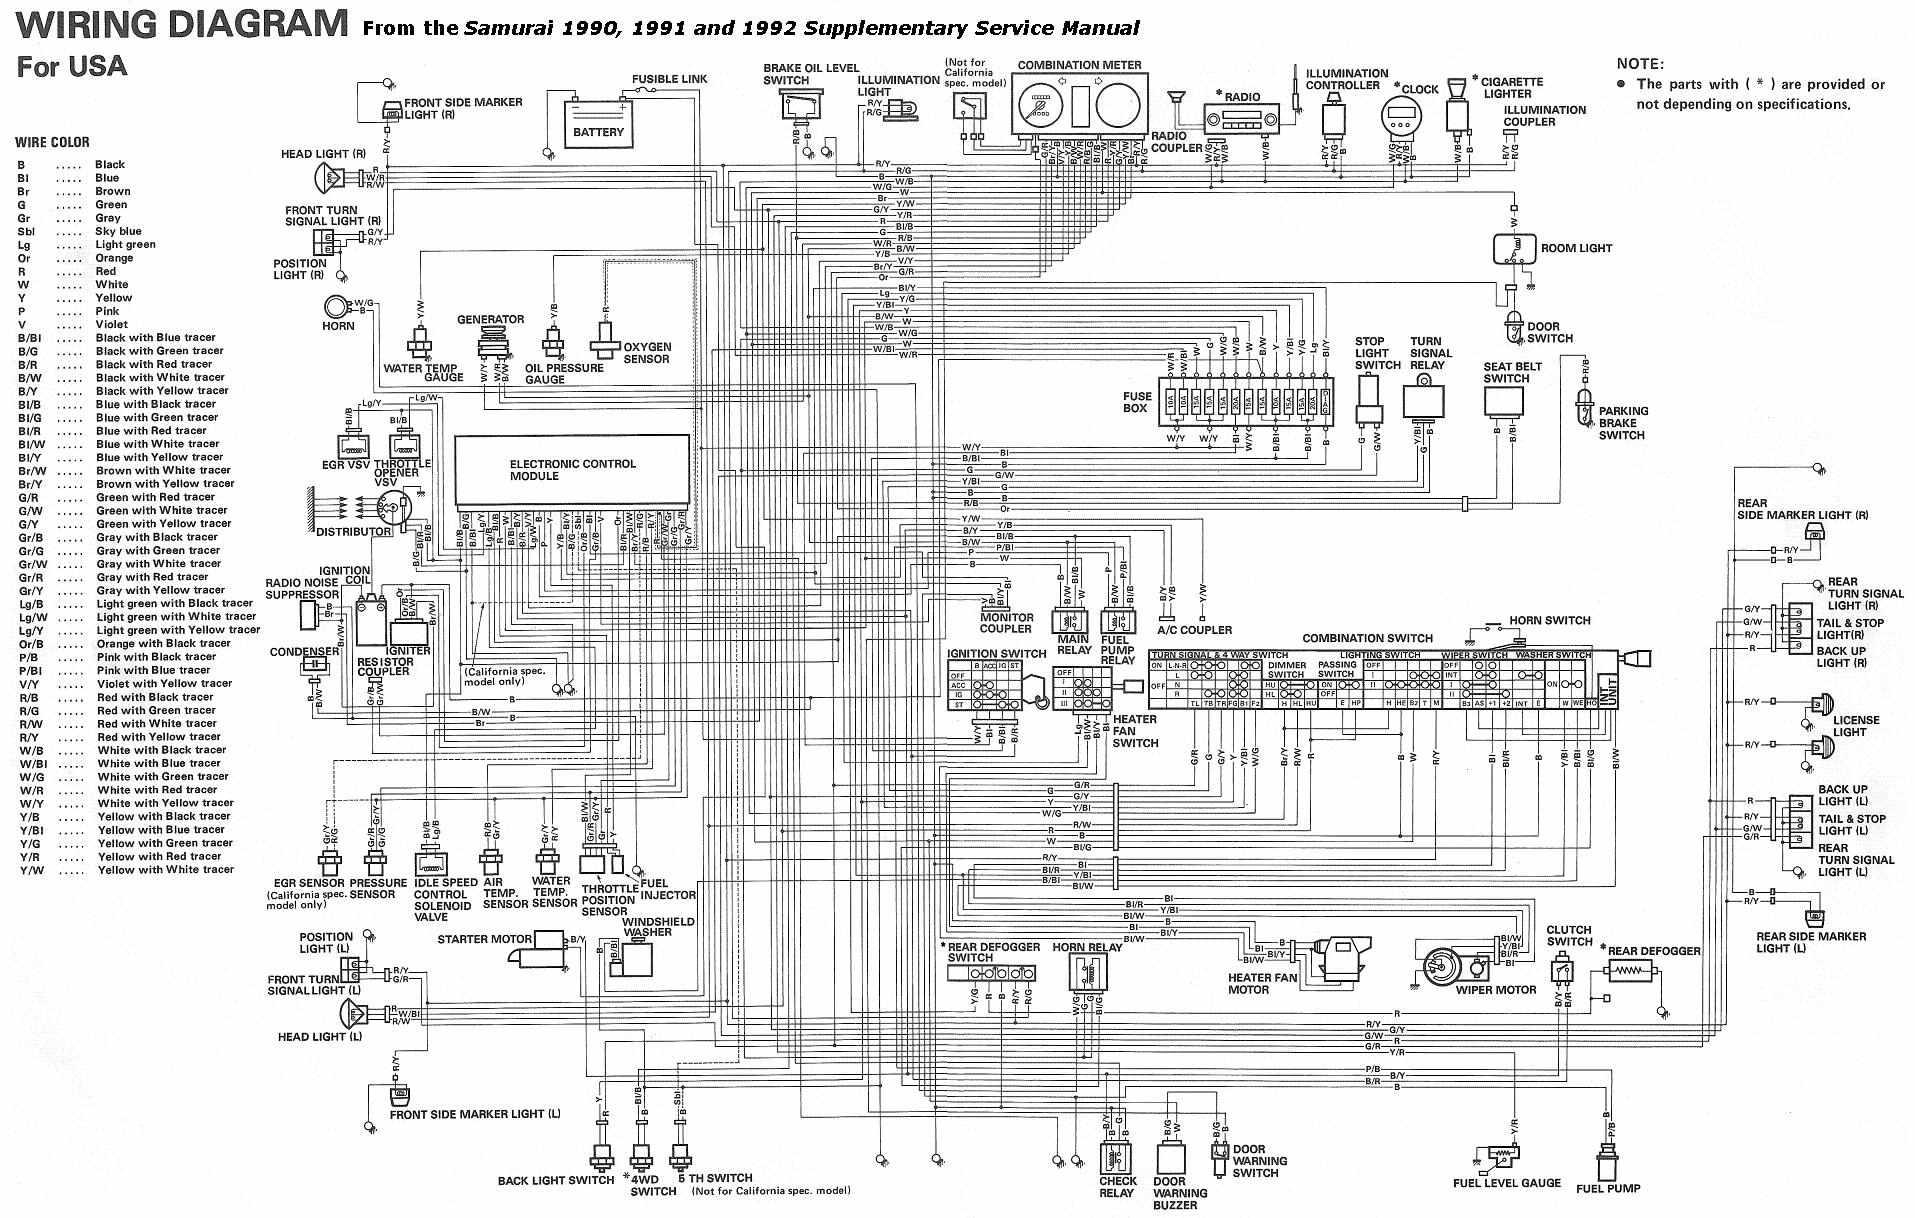 Wiring diagram maruti alto car jzgreentown maruti alto wiring diagram pdf efcaviation asfbconference2016 Image collections